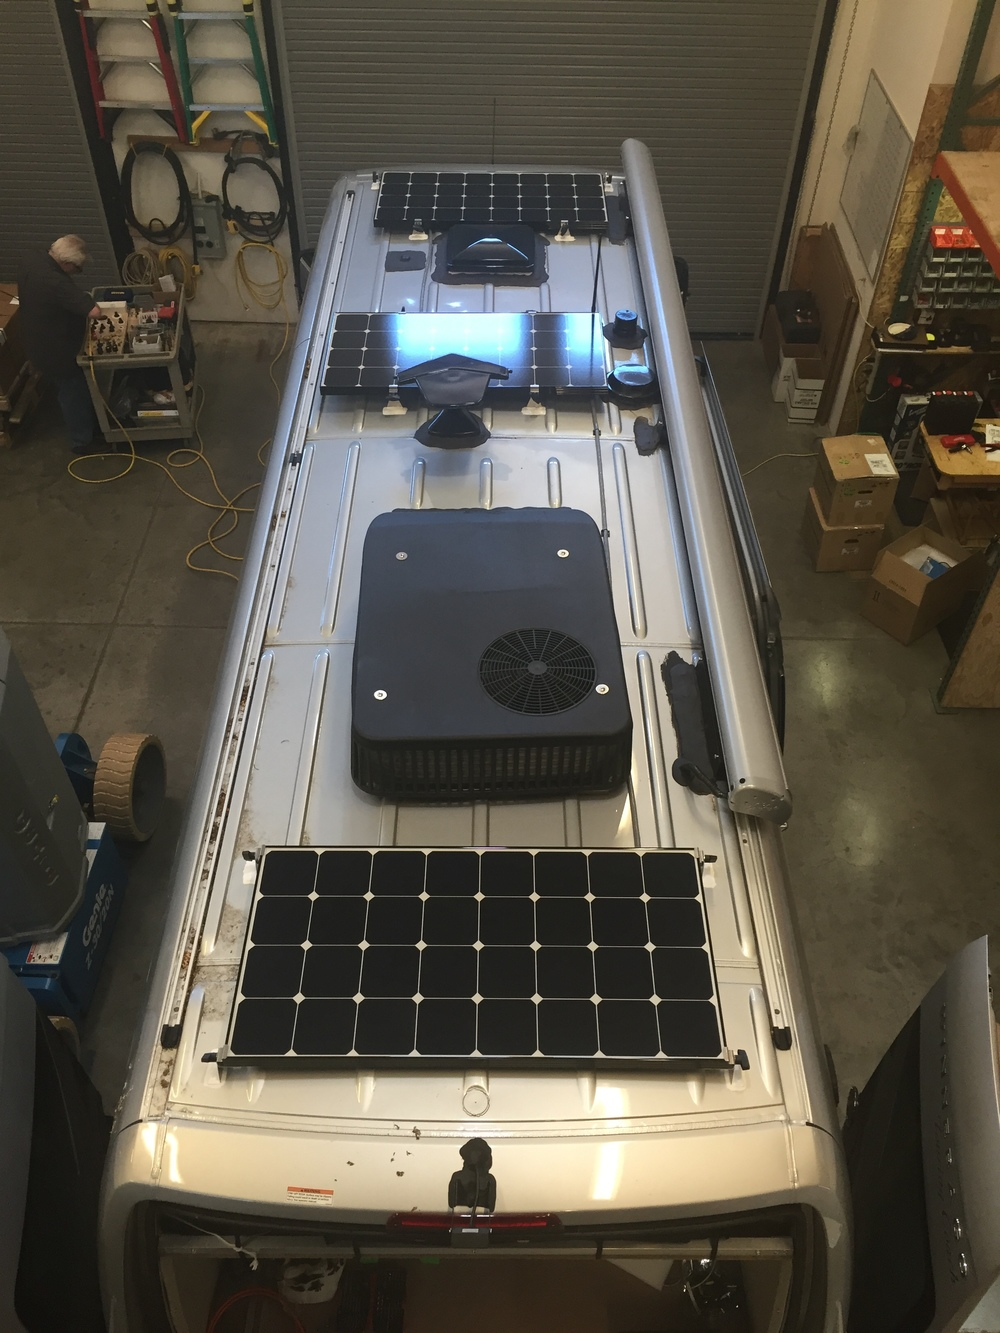 300W of solar panels